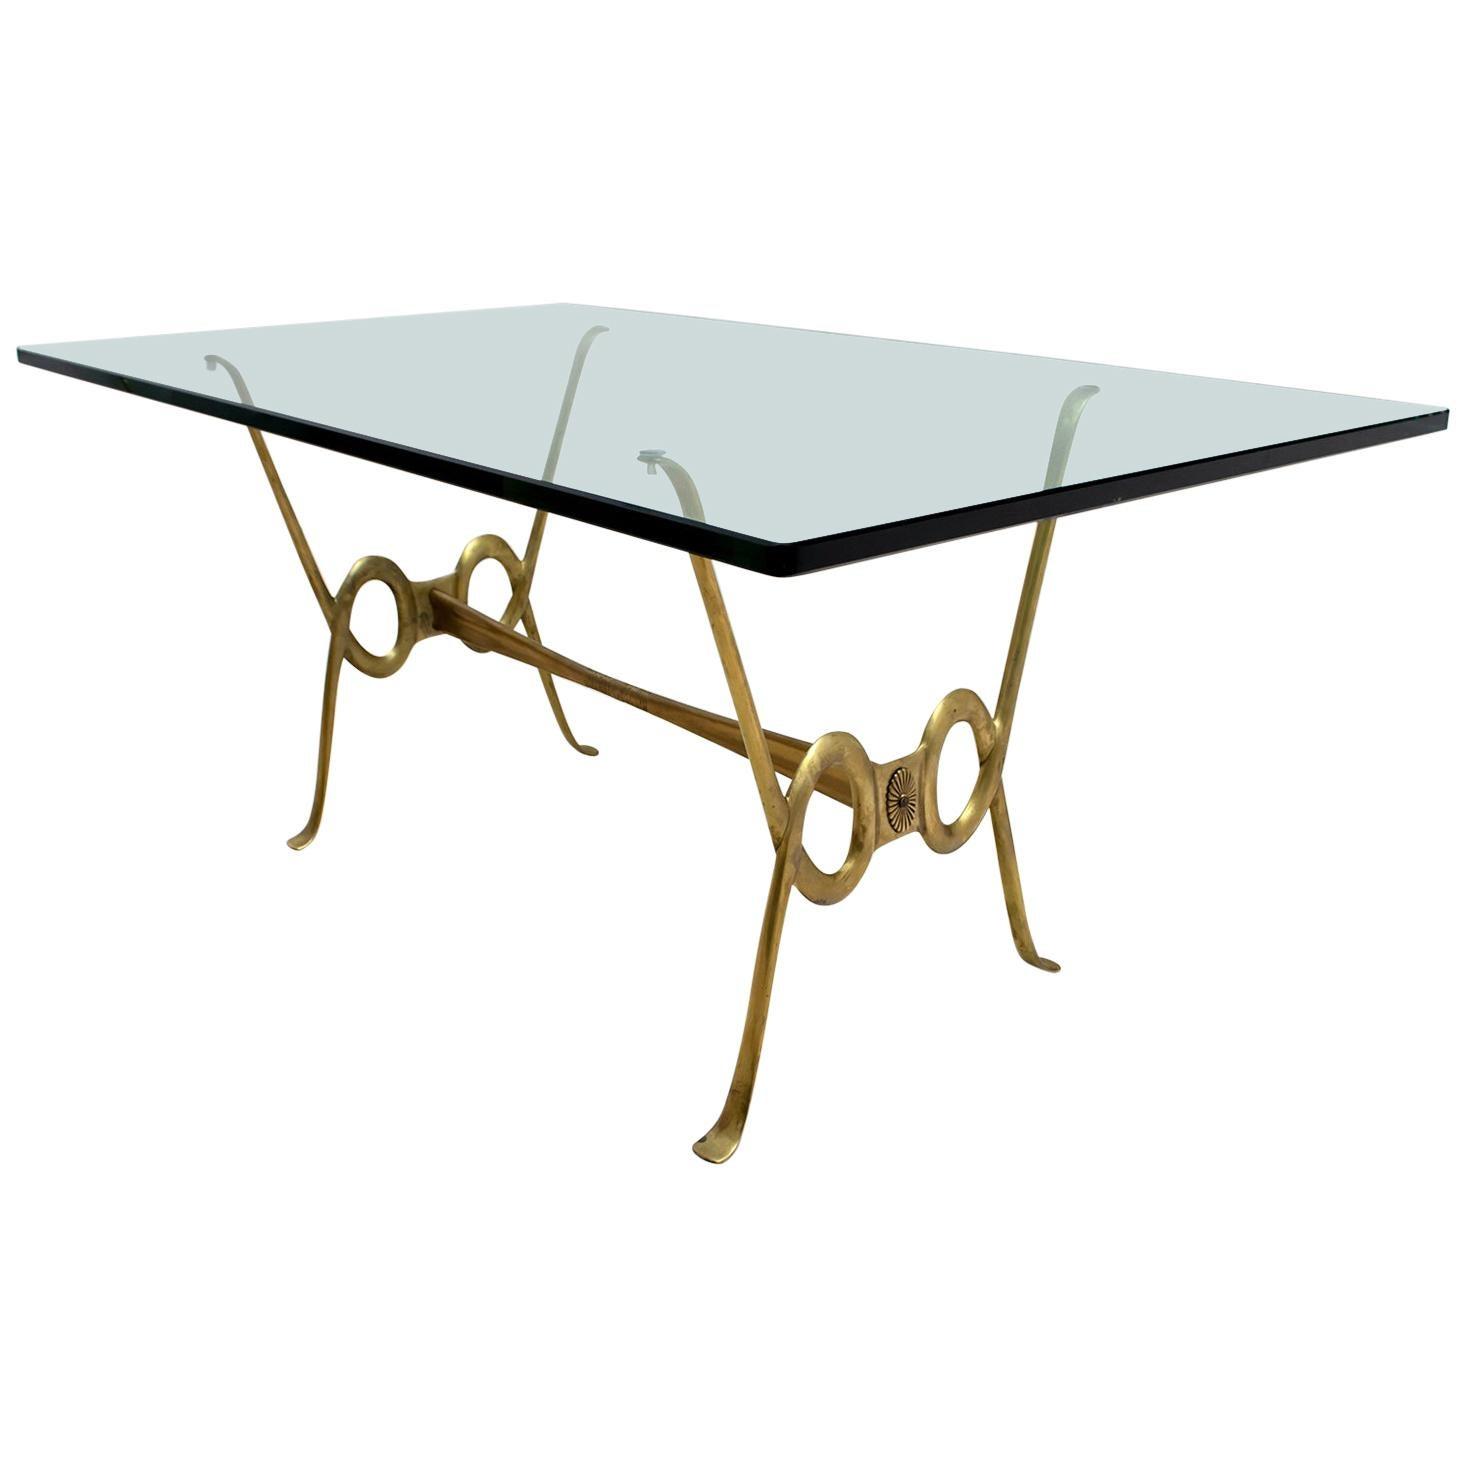 After Osvaldo Borsani Midcentury Italian Brass and Crystal Coffee Table, 1950s